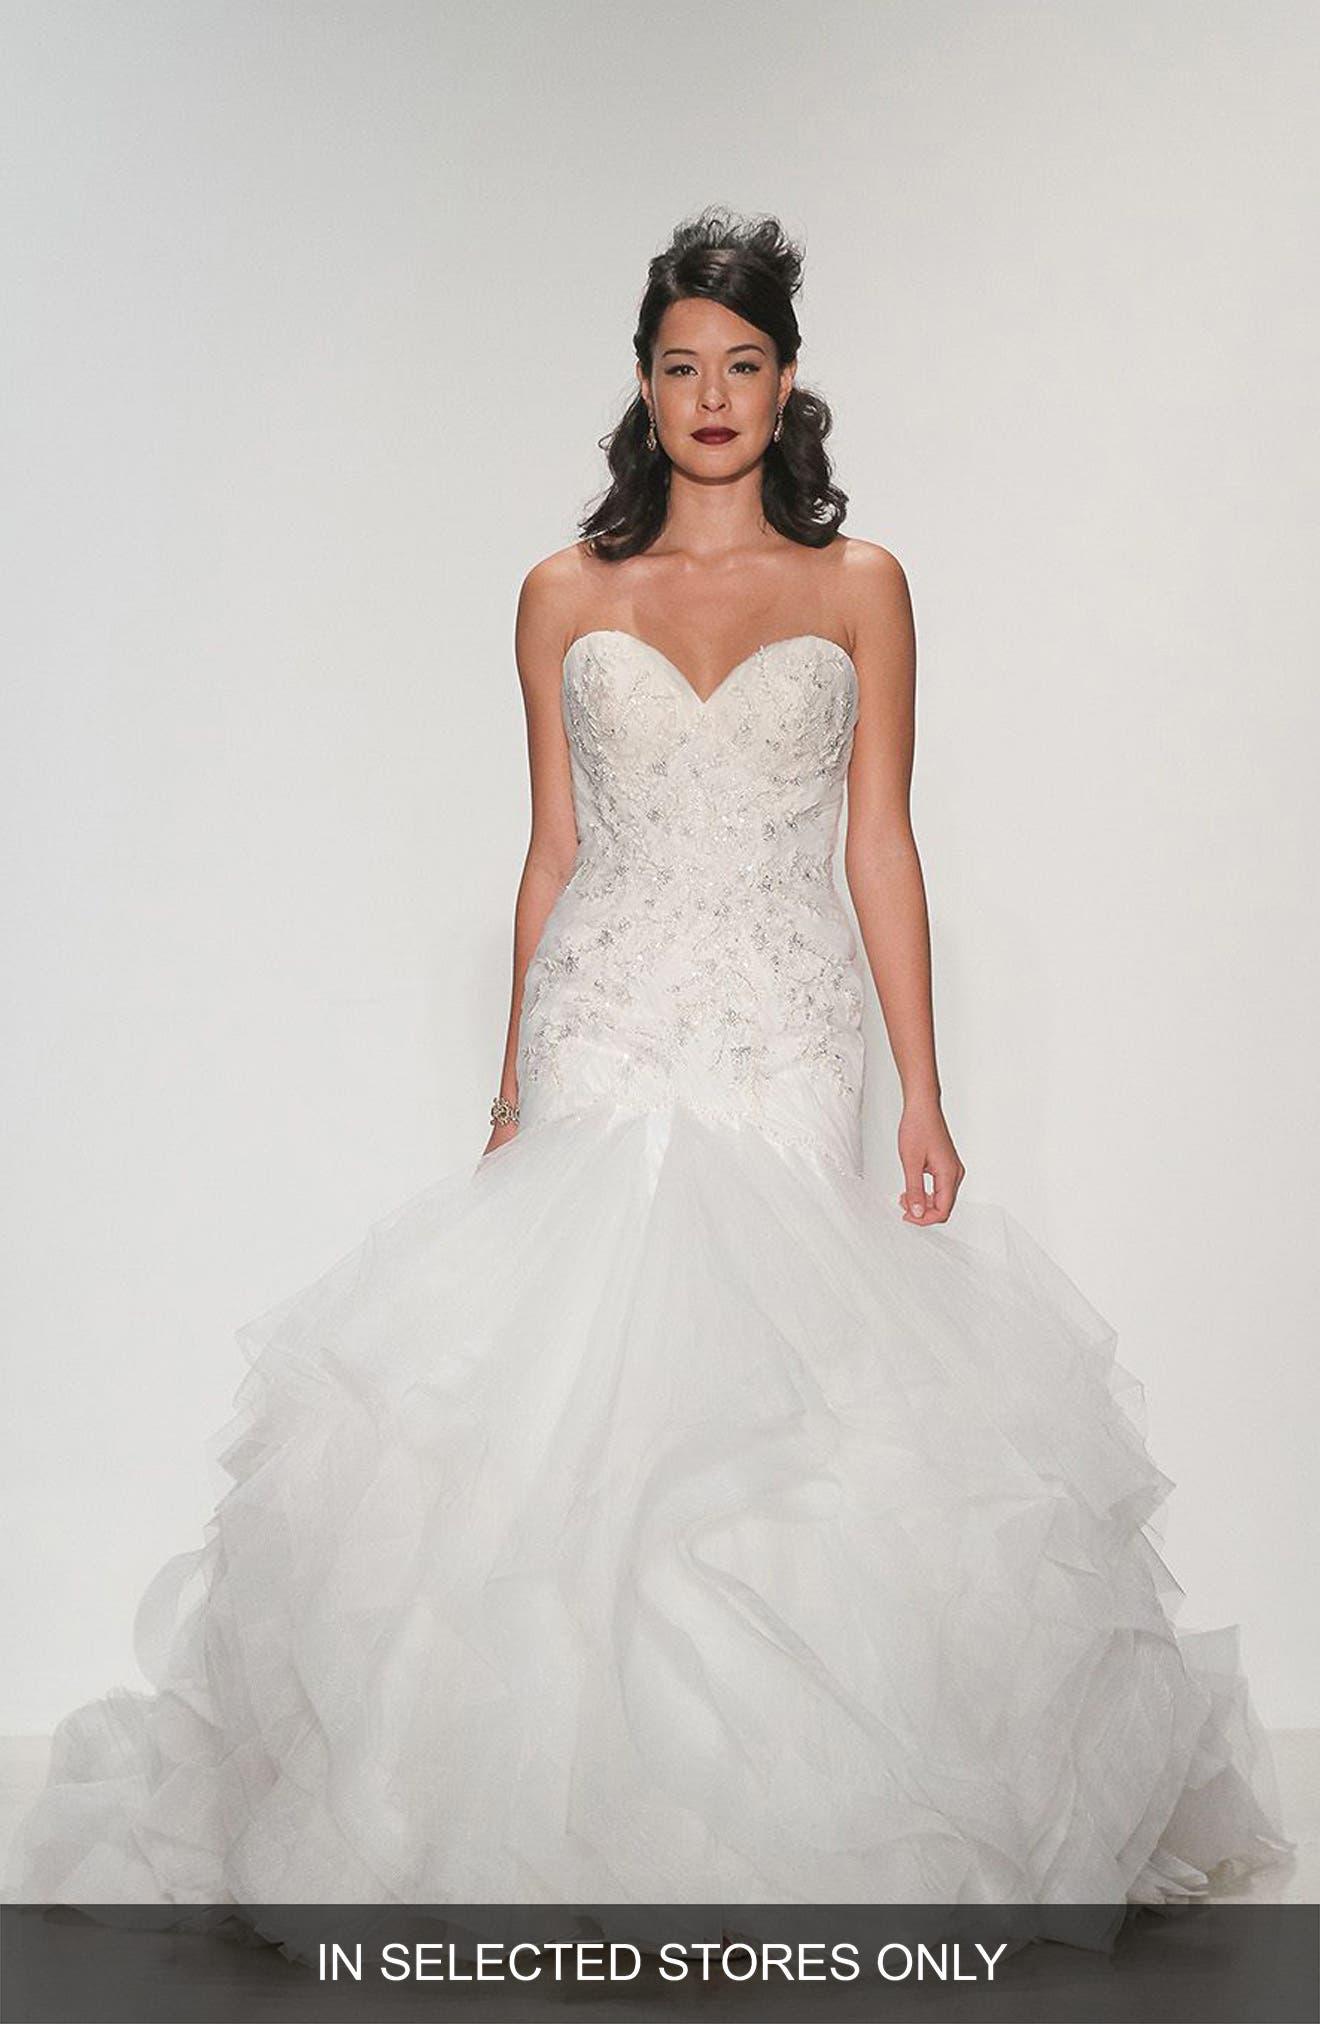 Matthew Christopher Adrianna Embellished Strapless Tulle & Organza Gown